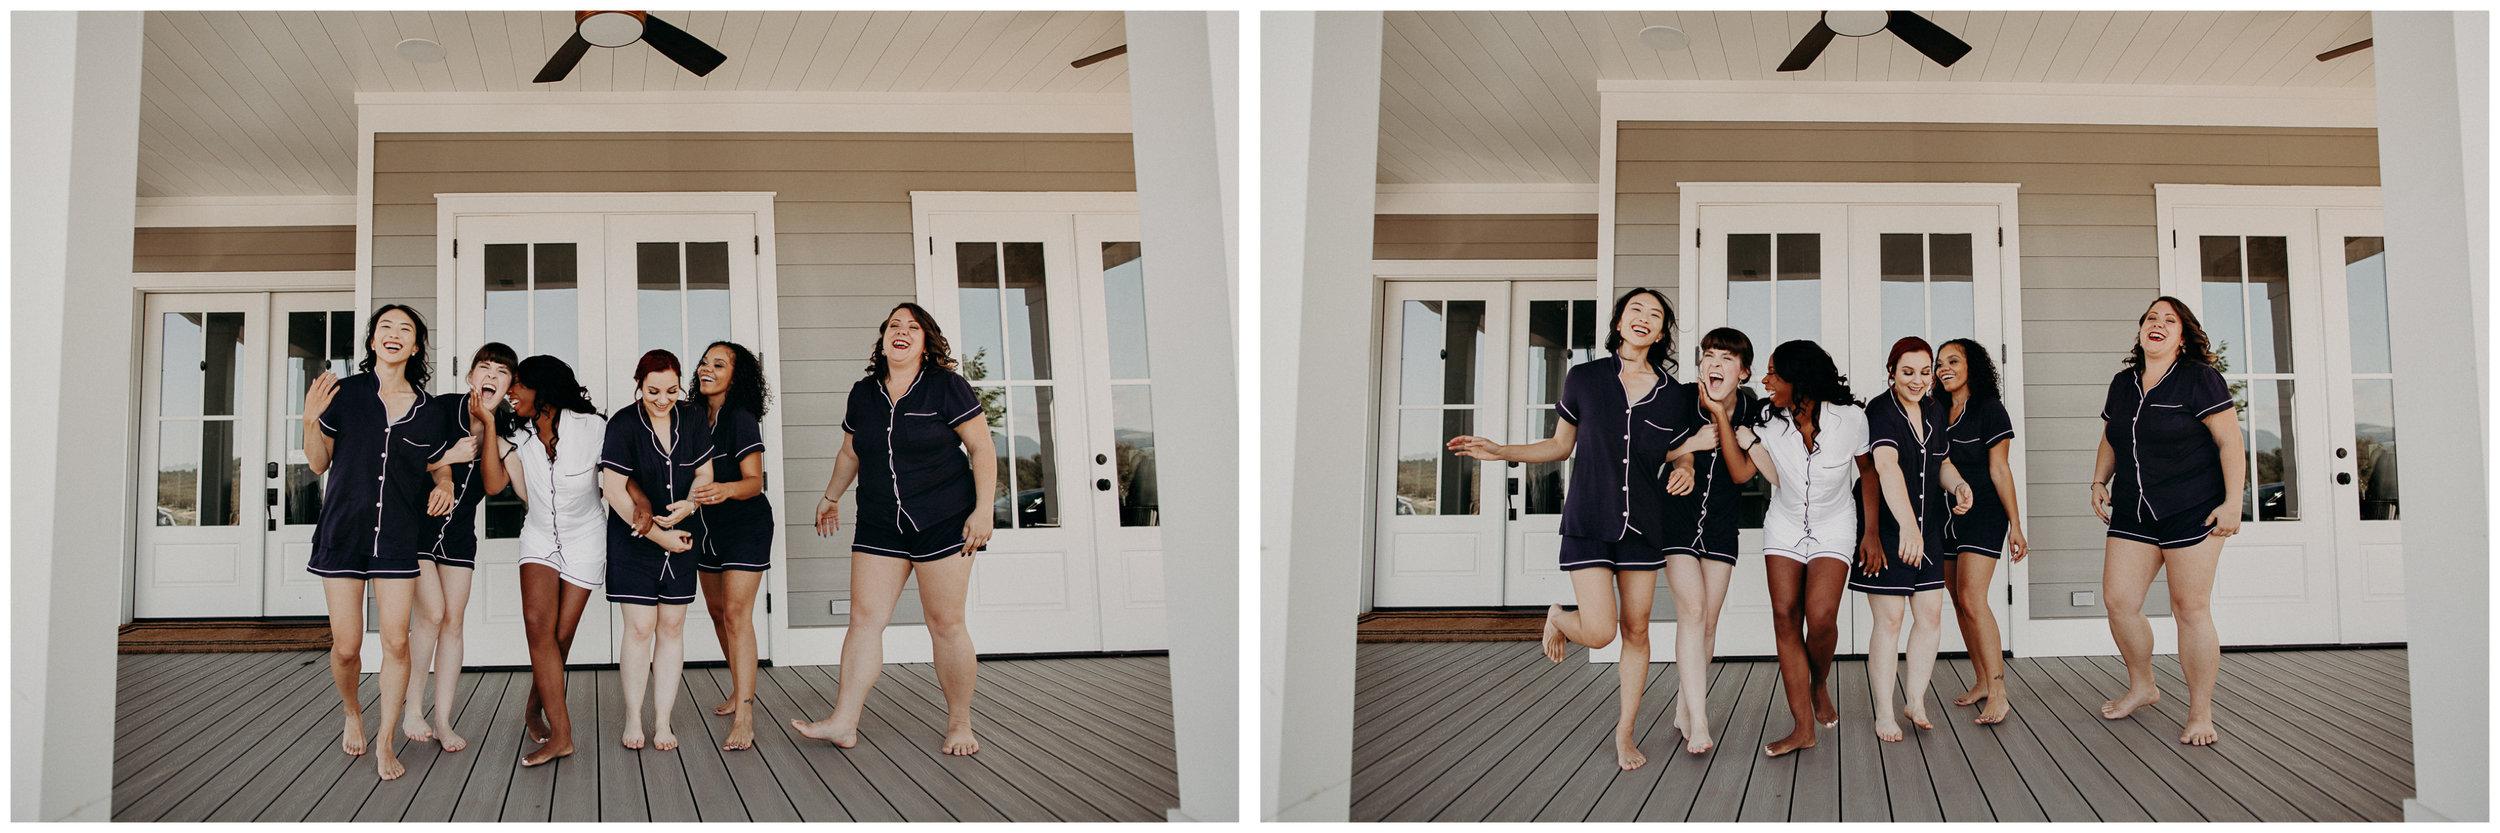 13- Wedding_day_atlanta_georgia_bridesmaids_matching_pajamas_details_aline_marin_photography_-2.jpg